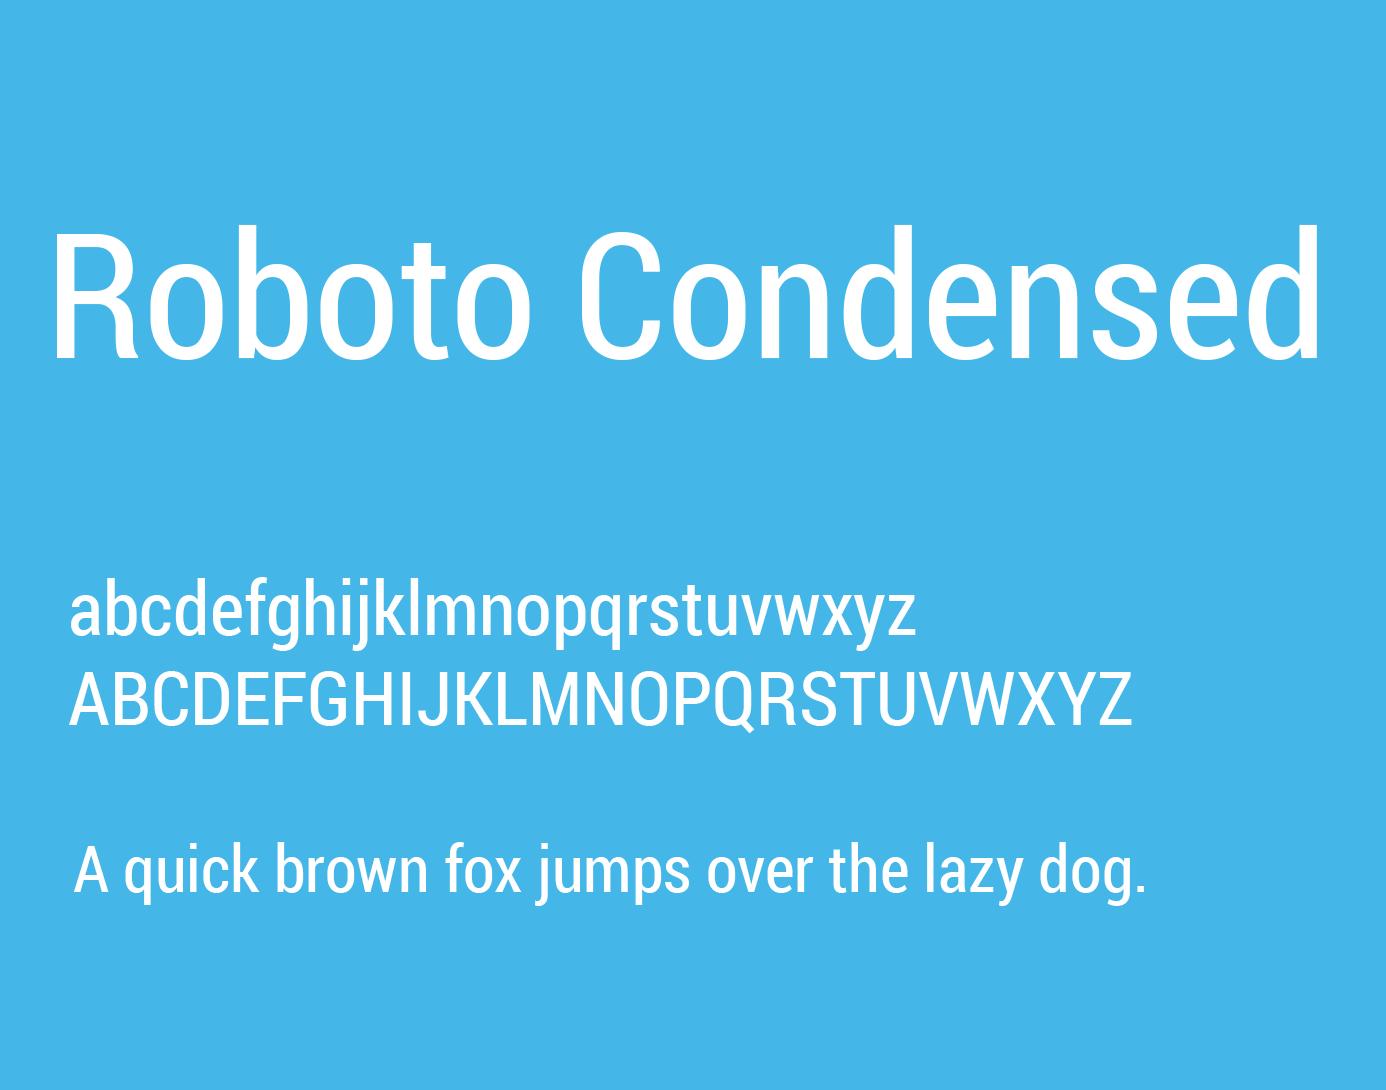 https://fontclarity.com/wp-content/uploads/2019/09/roboto-condensed-font-download-0.png Free Download